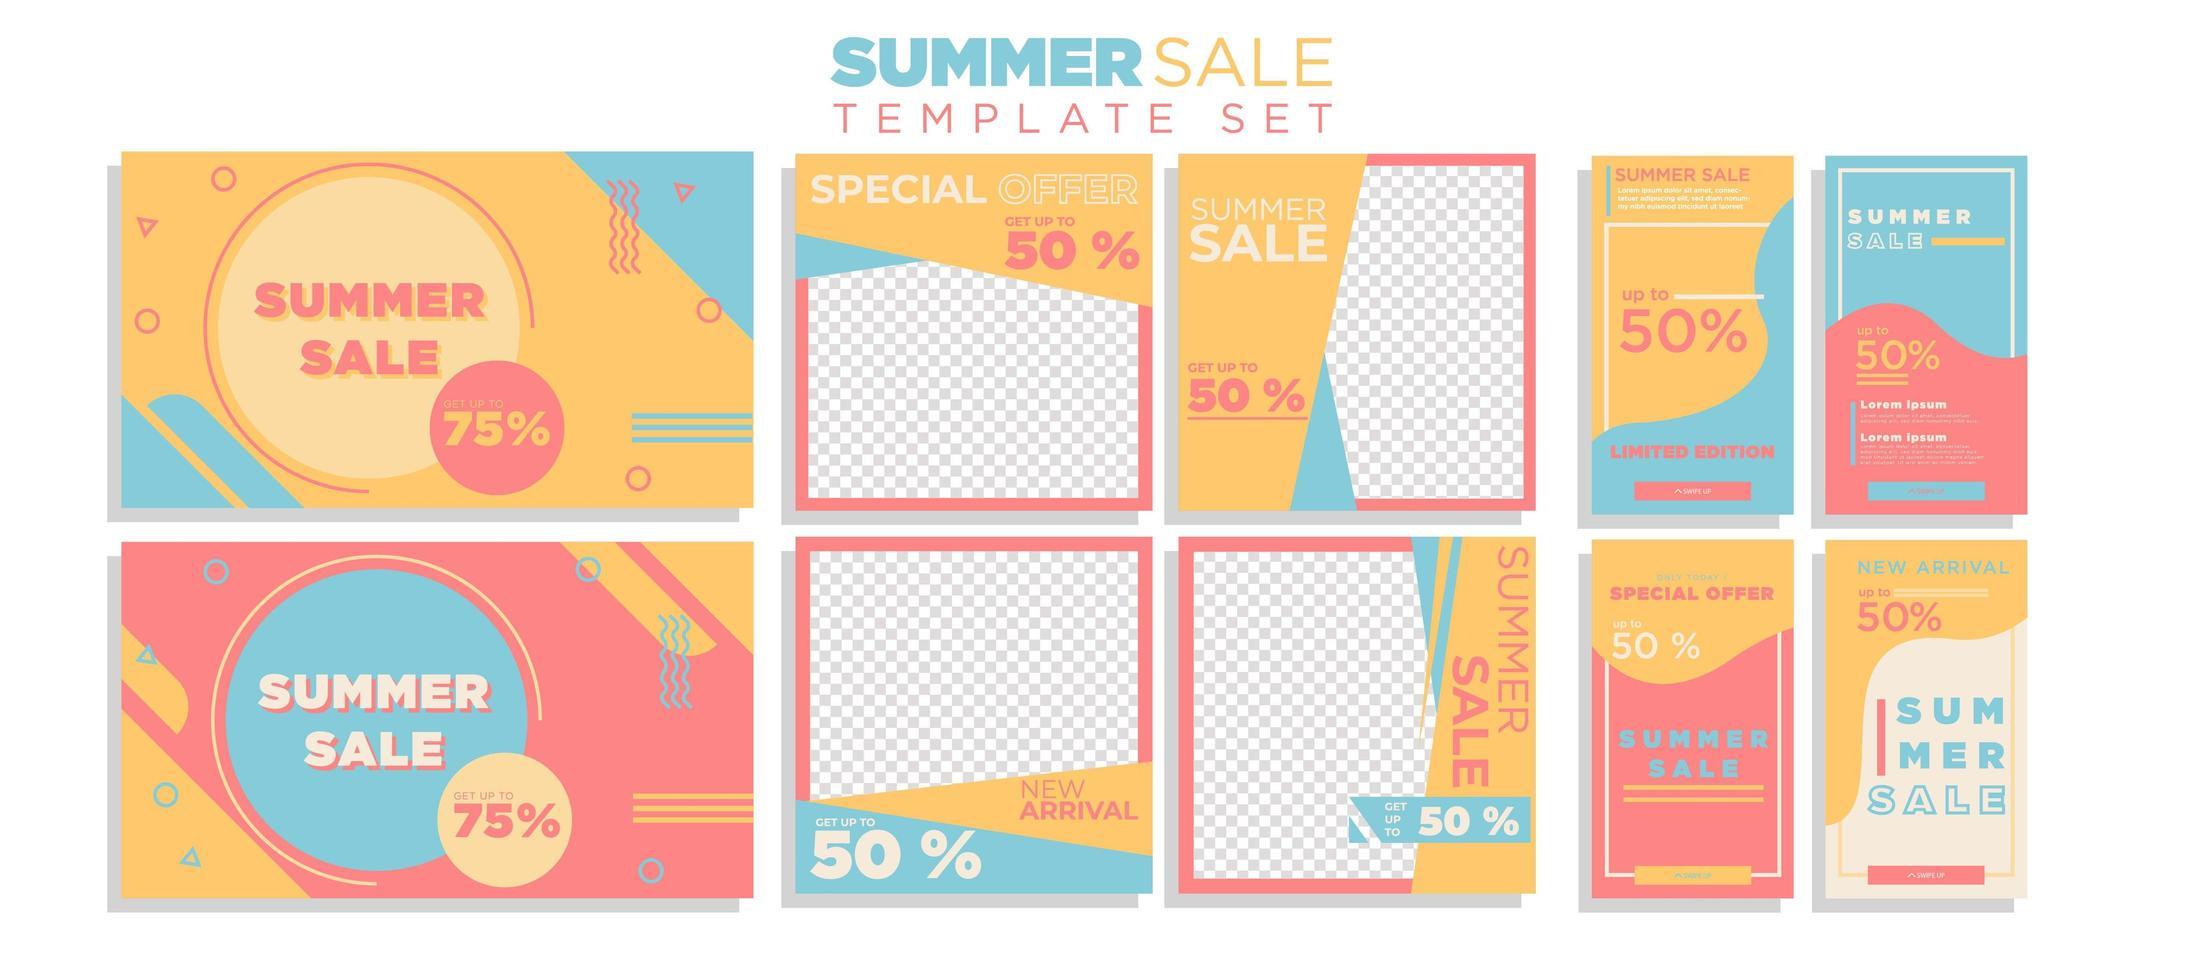 Sommerverkauf Social Media Story und Bannersammlung vektor